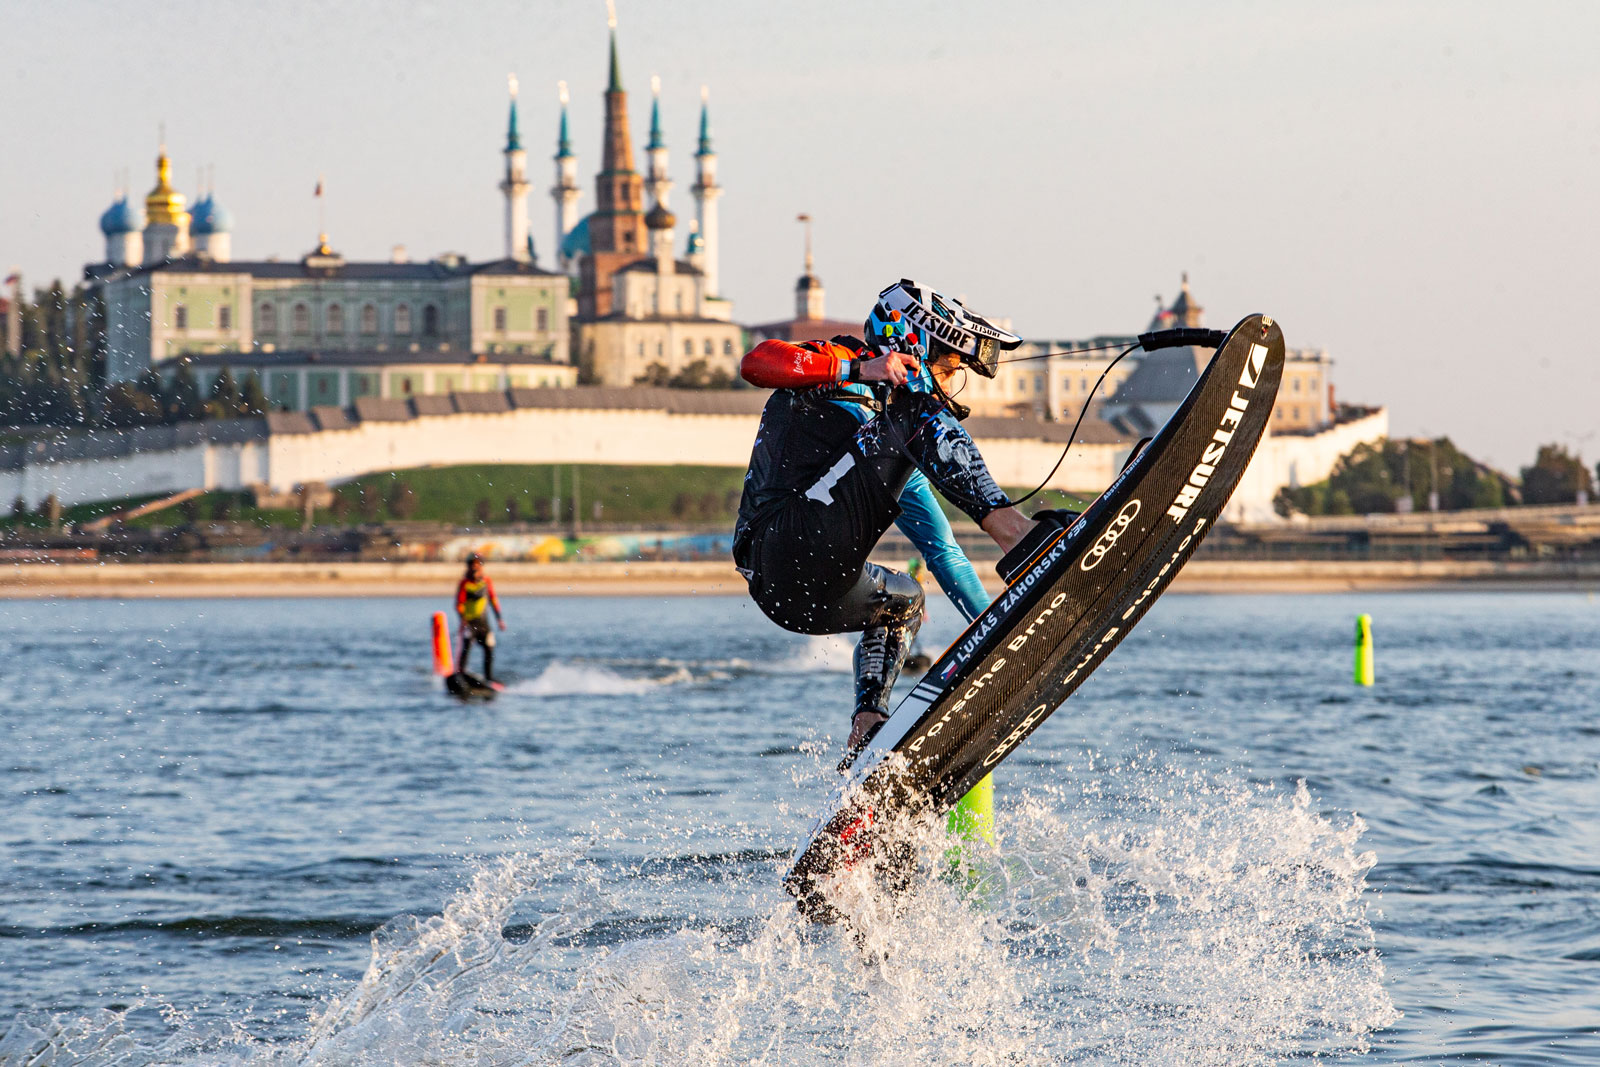 Text Credits & Photo Credits: MotoSurf WorldCup Kazan